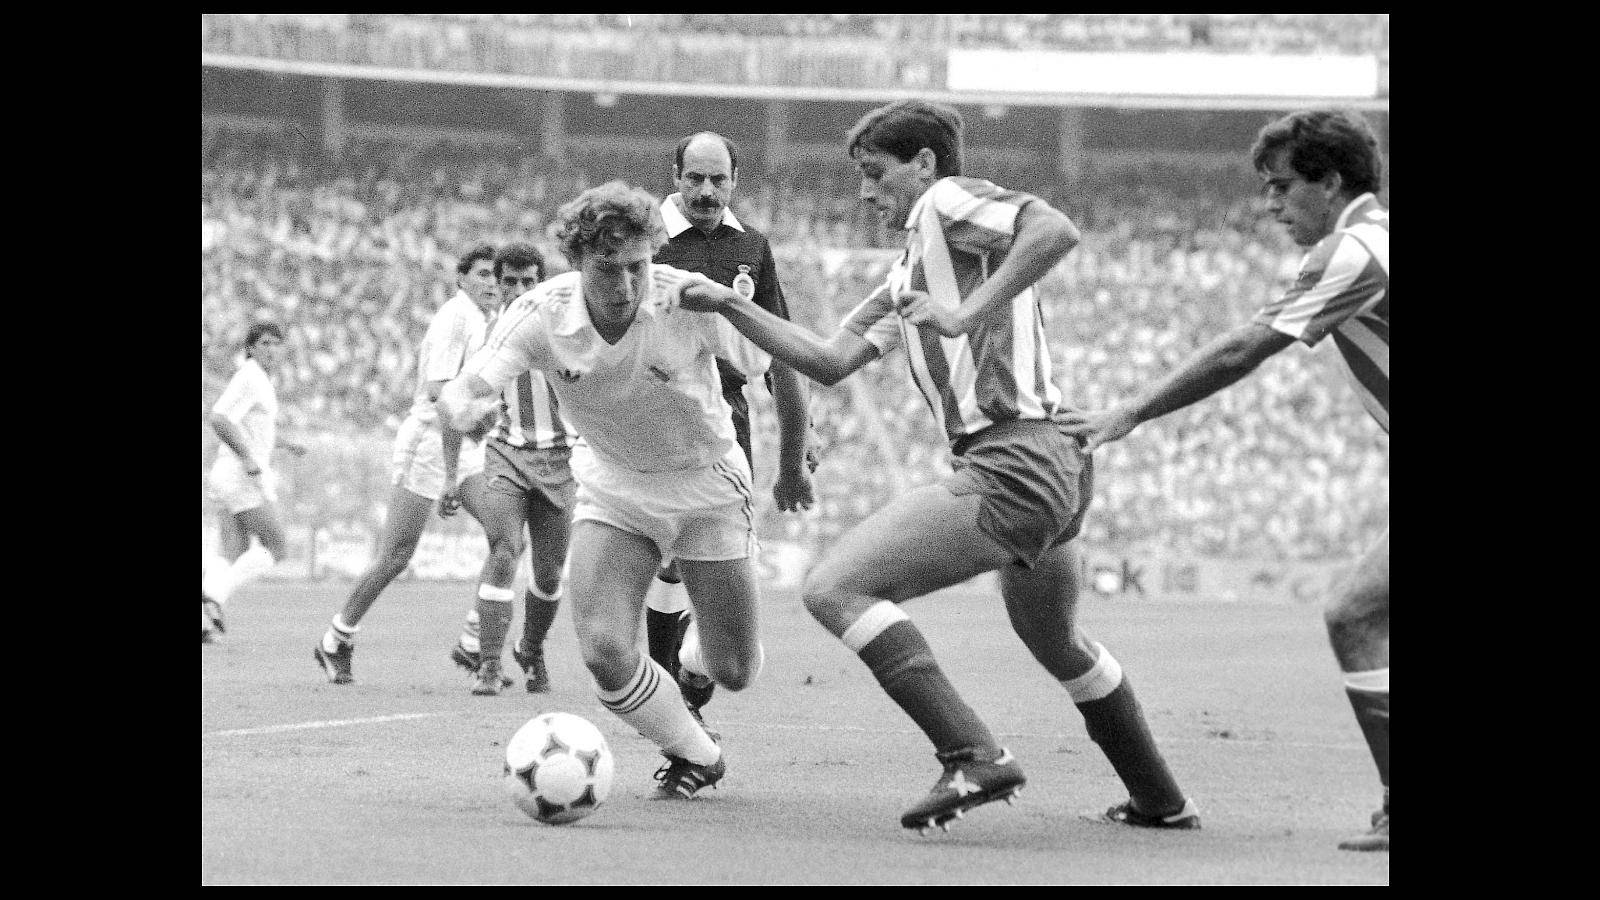 1985-atletico-real-madrid-derbi--1600x900